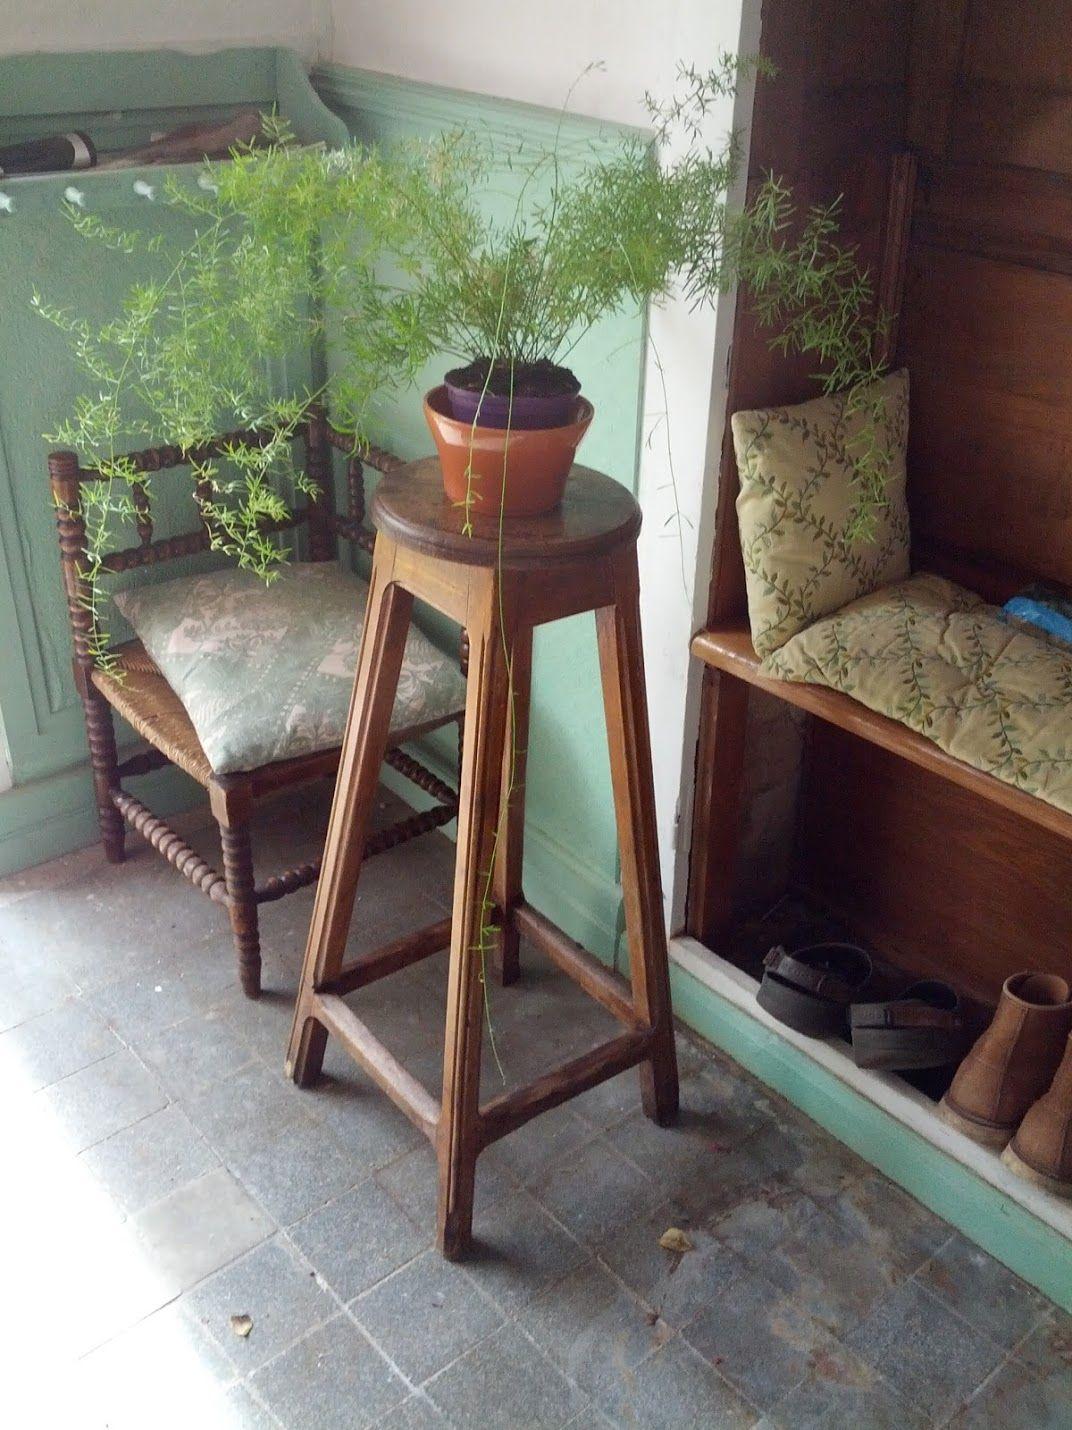 Sign in French bar stool, Stool, Bar stools